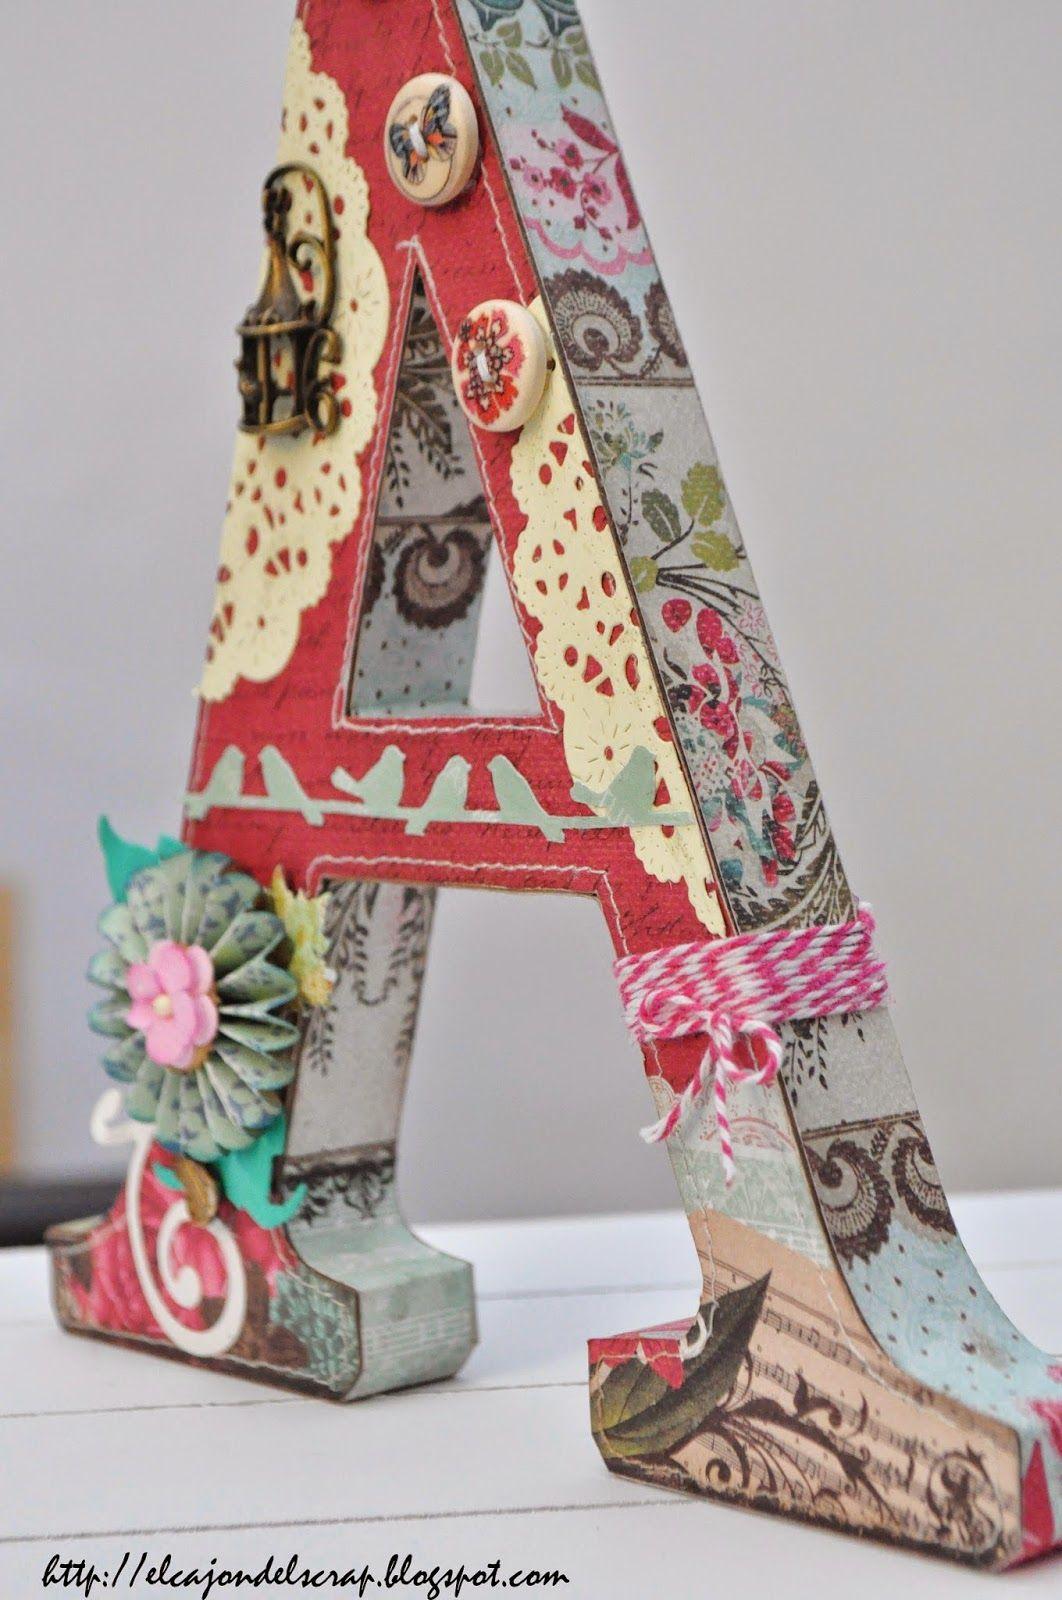 Decorated letter a letra a decorada con scrapbooking decorated letters letras decoradas - Letras decoradas scrap ...